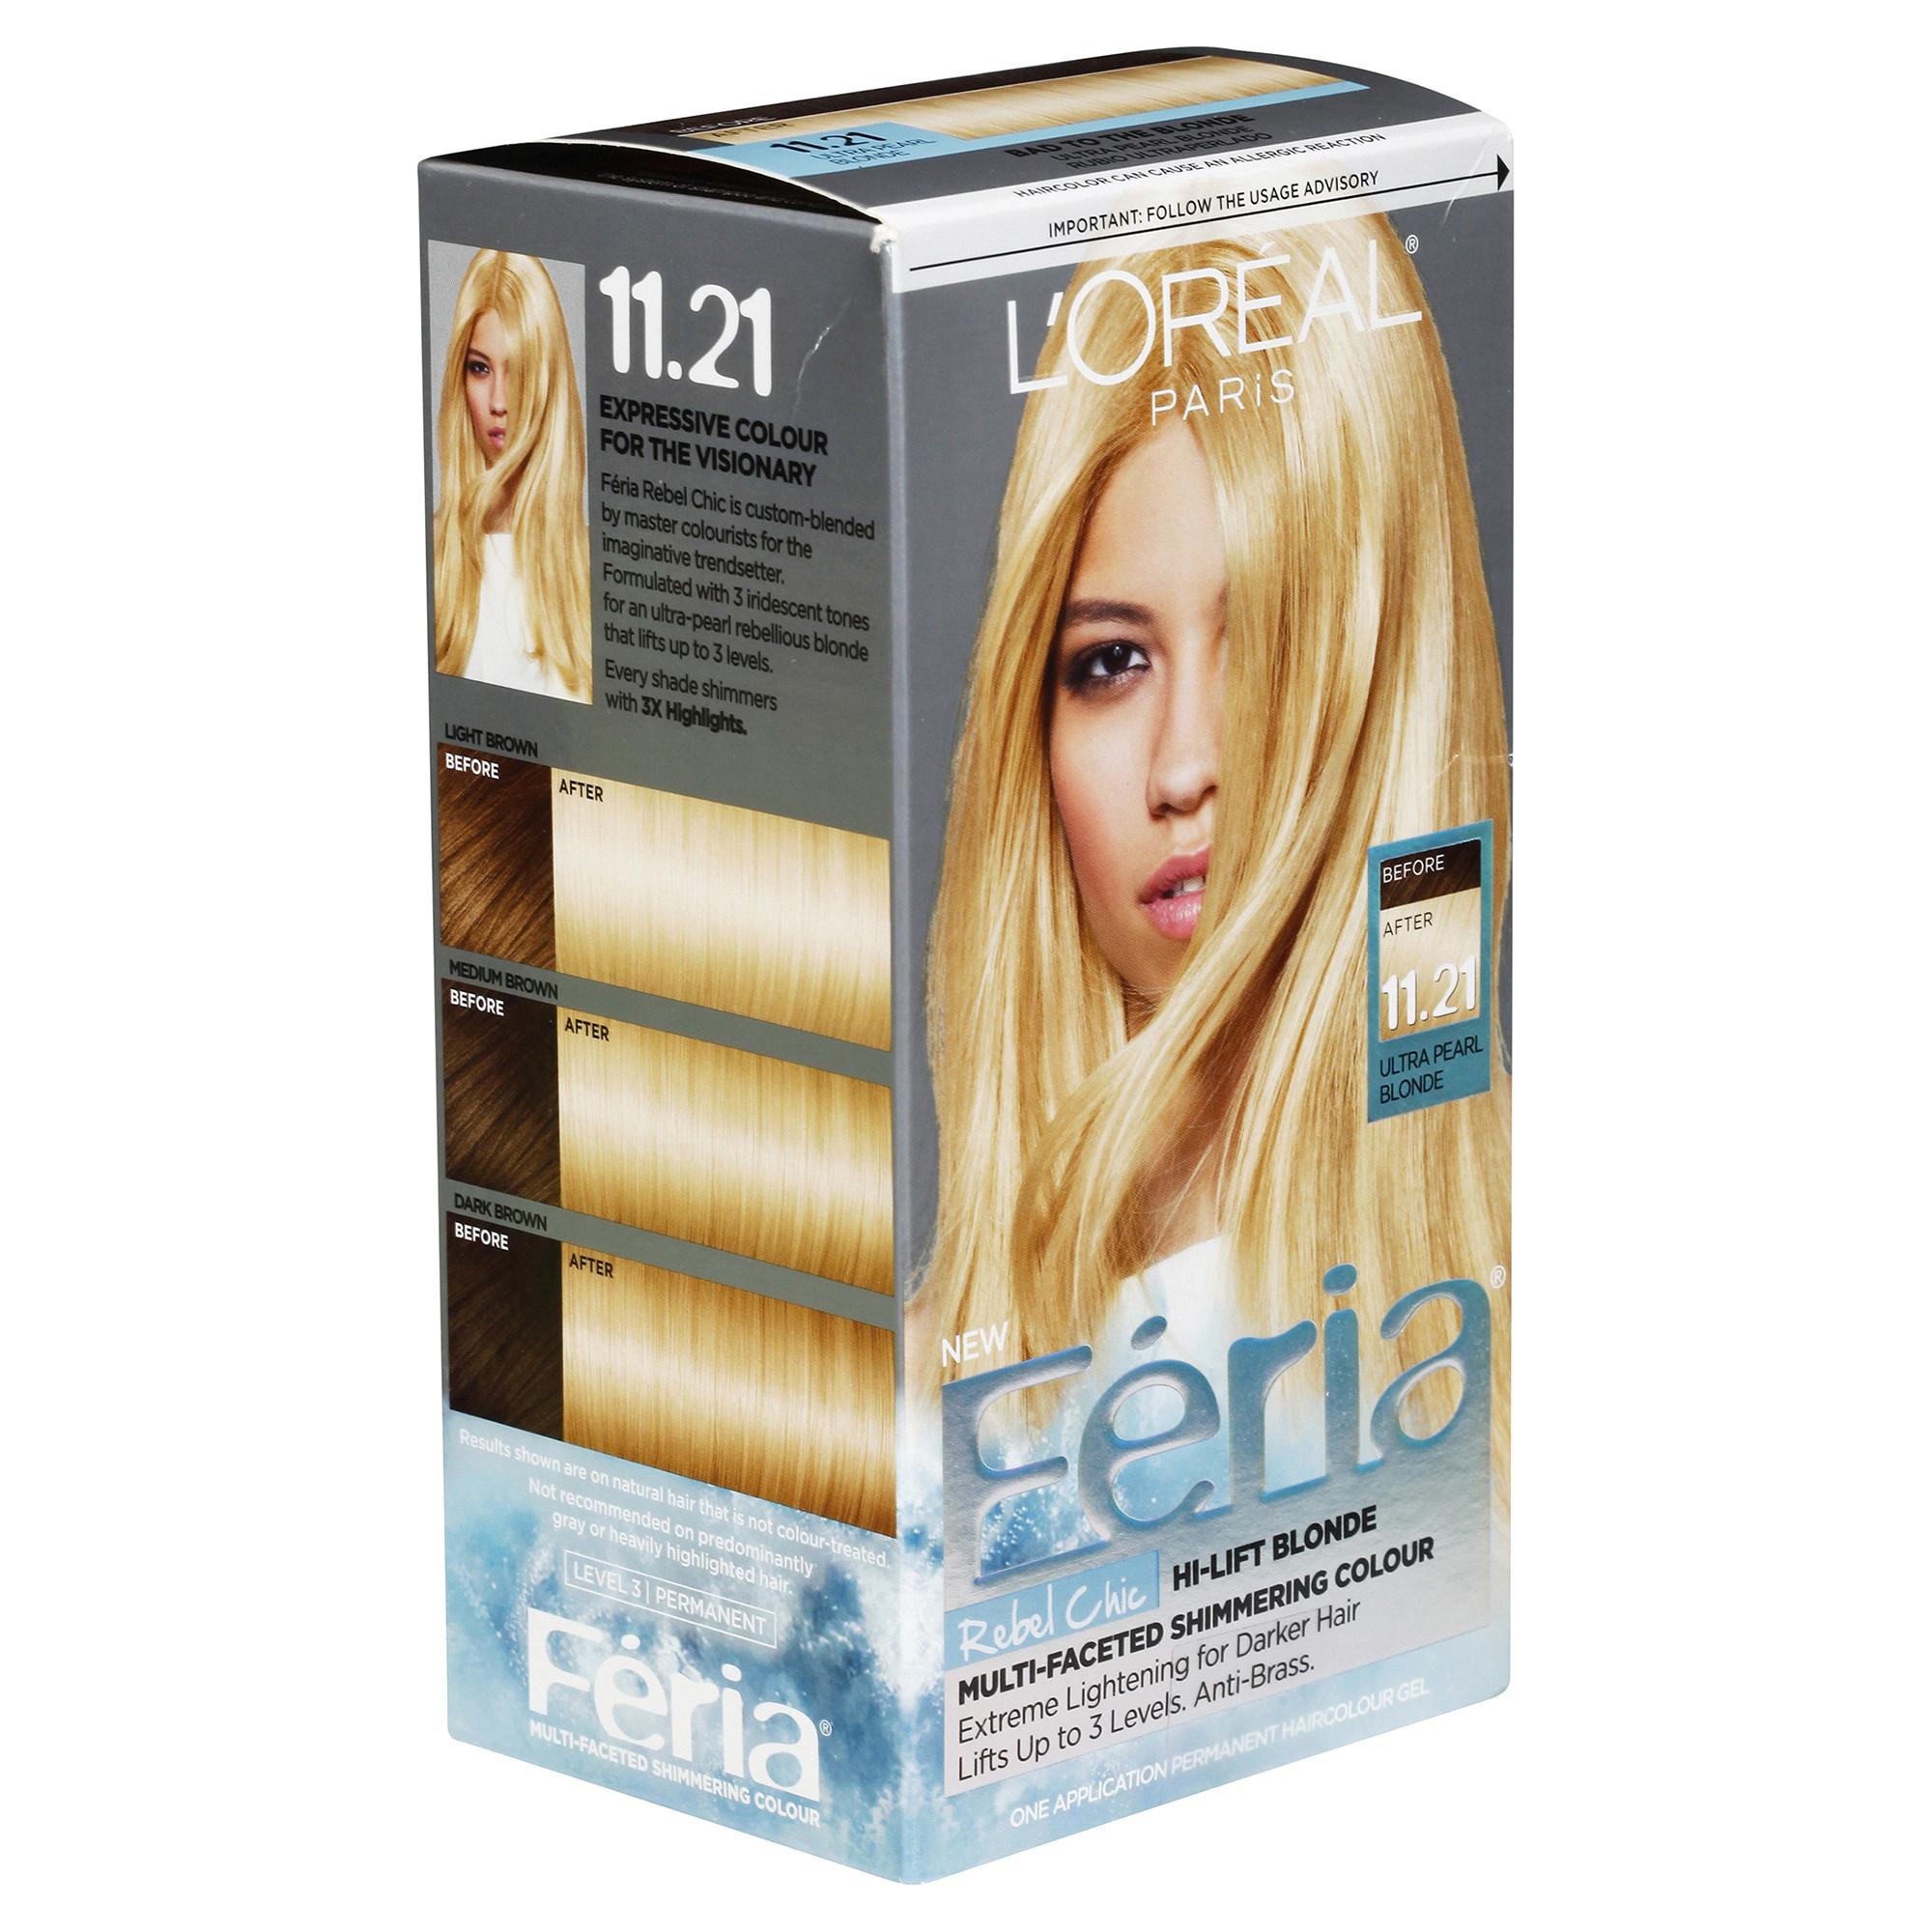 Loreal Feria Hi Lift Blonde Multi Faceted Shimmering Colour 1121